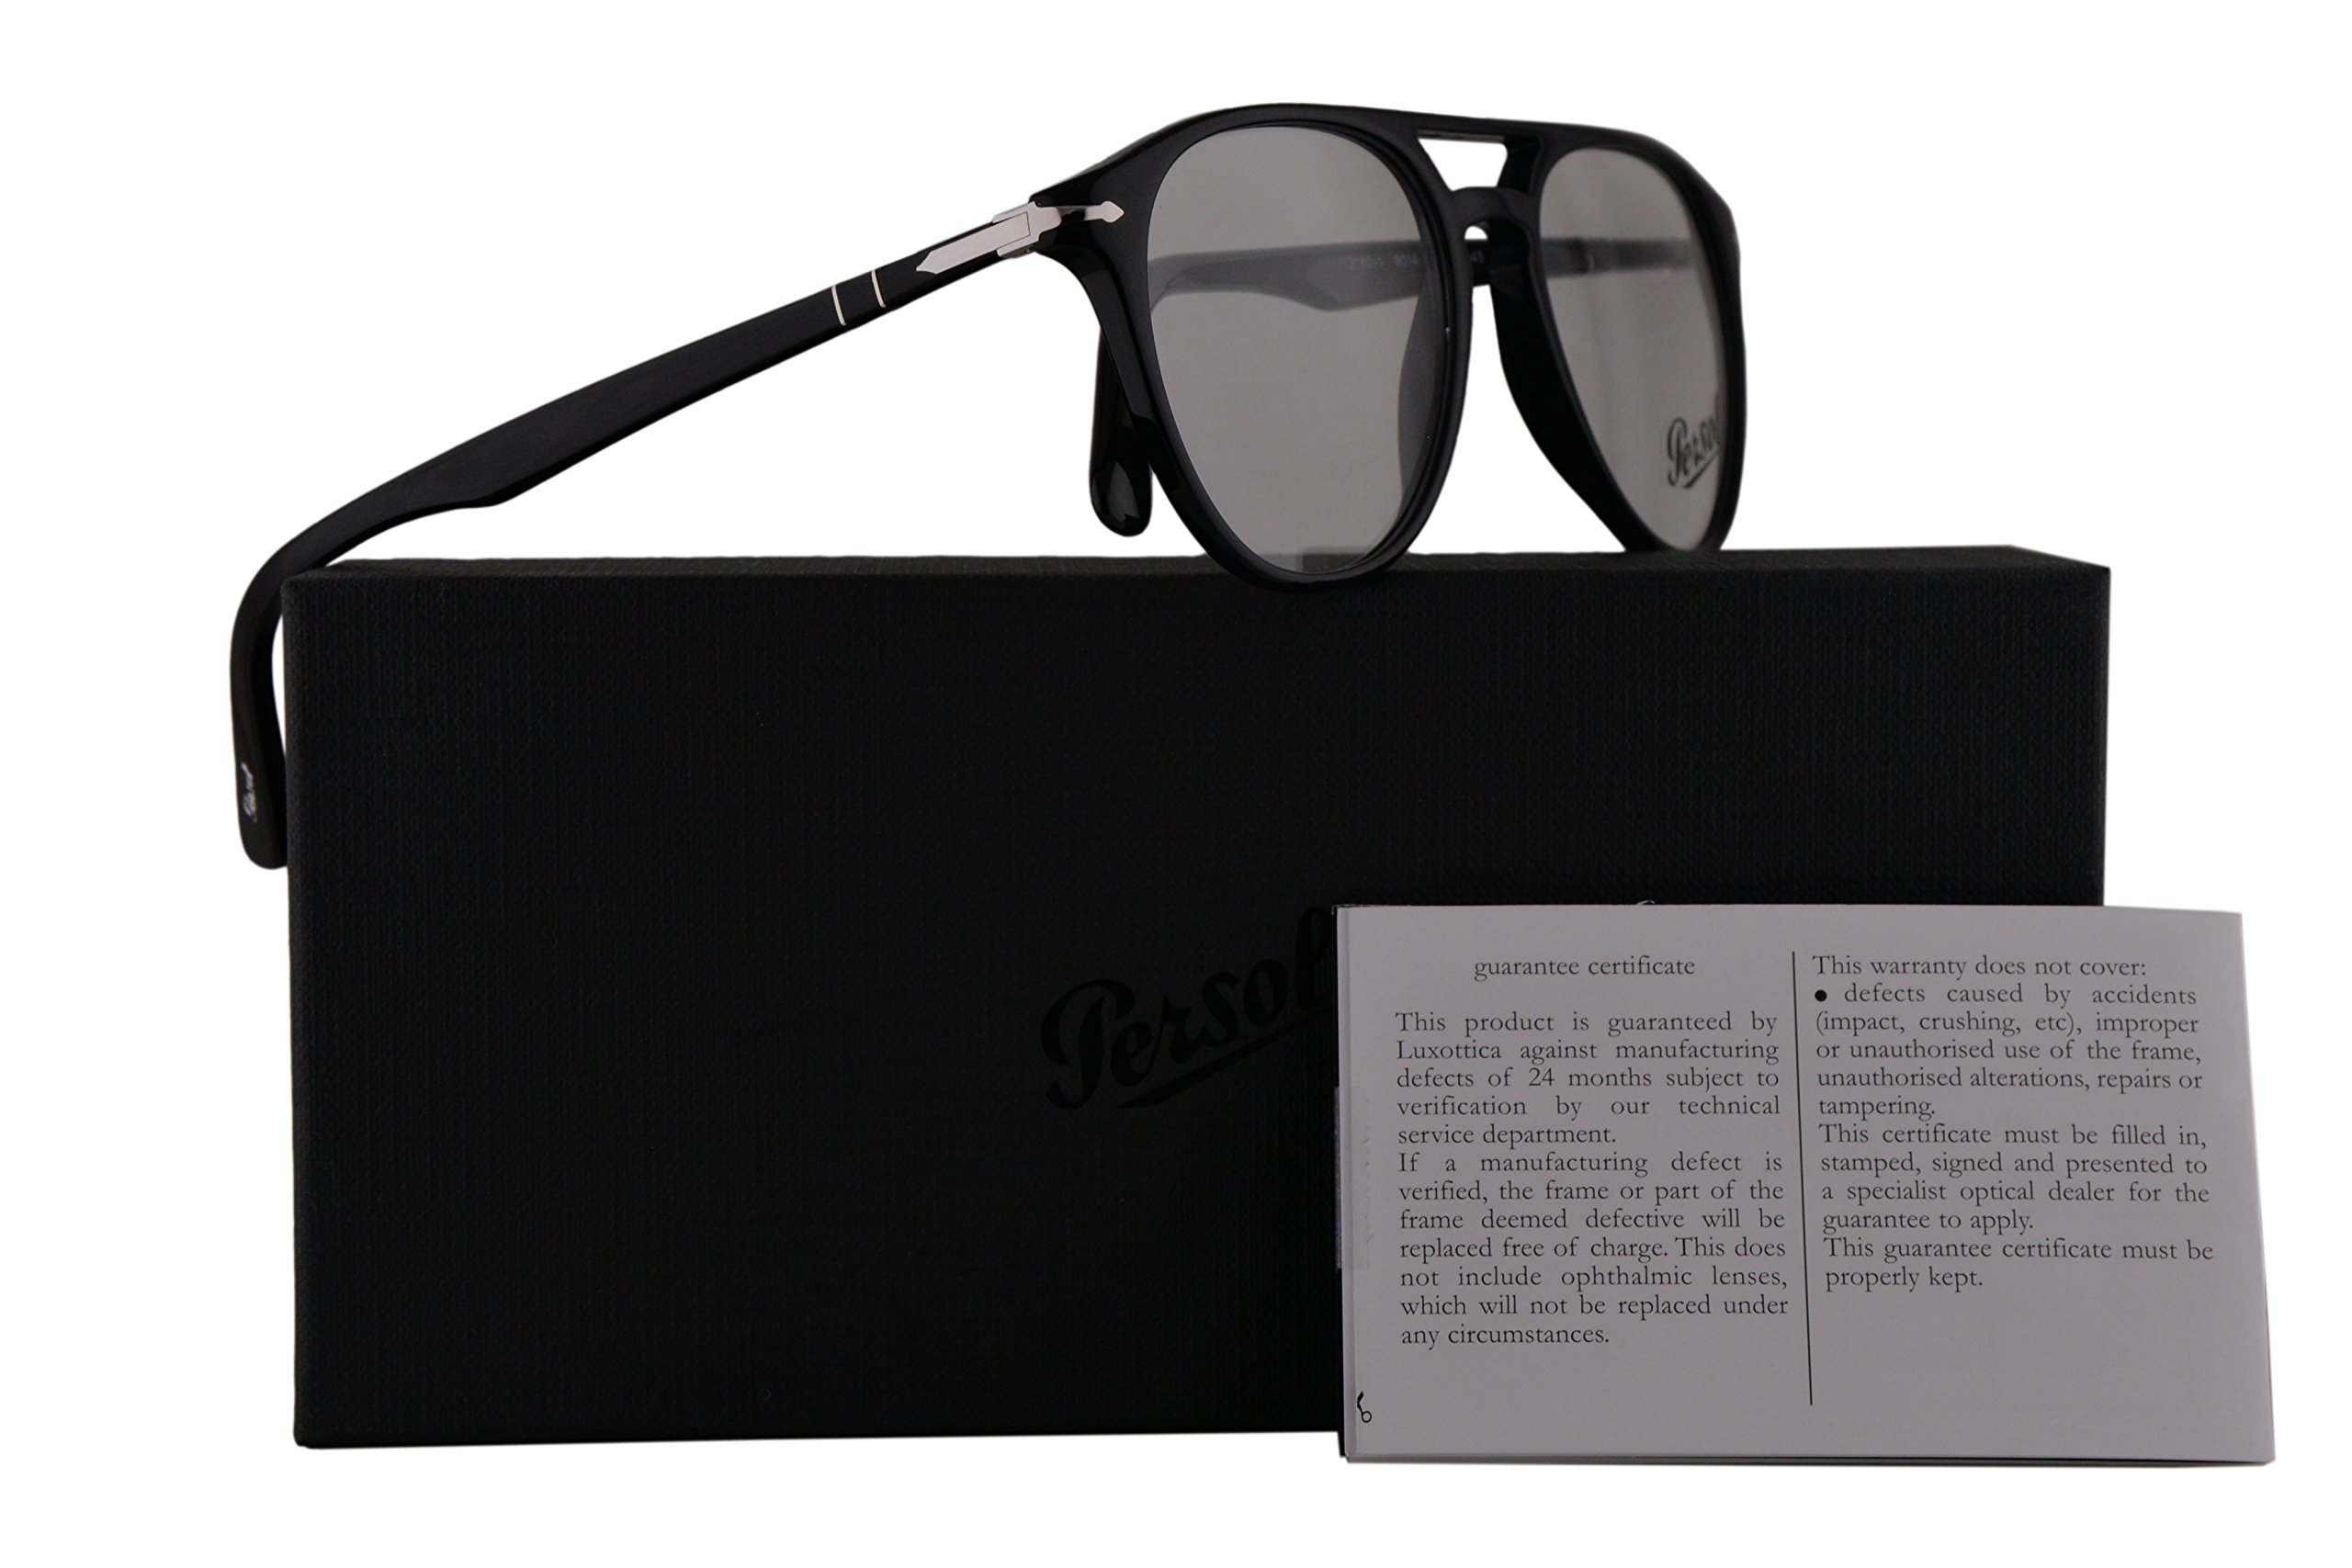 Persol PO3160V Eyeglasses 52-18-145 Light Brown Havana w/Demo Clear Lens 9041 PO 3160-V PO3160-V PO 3160V by Persol